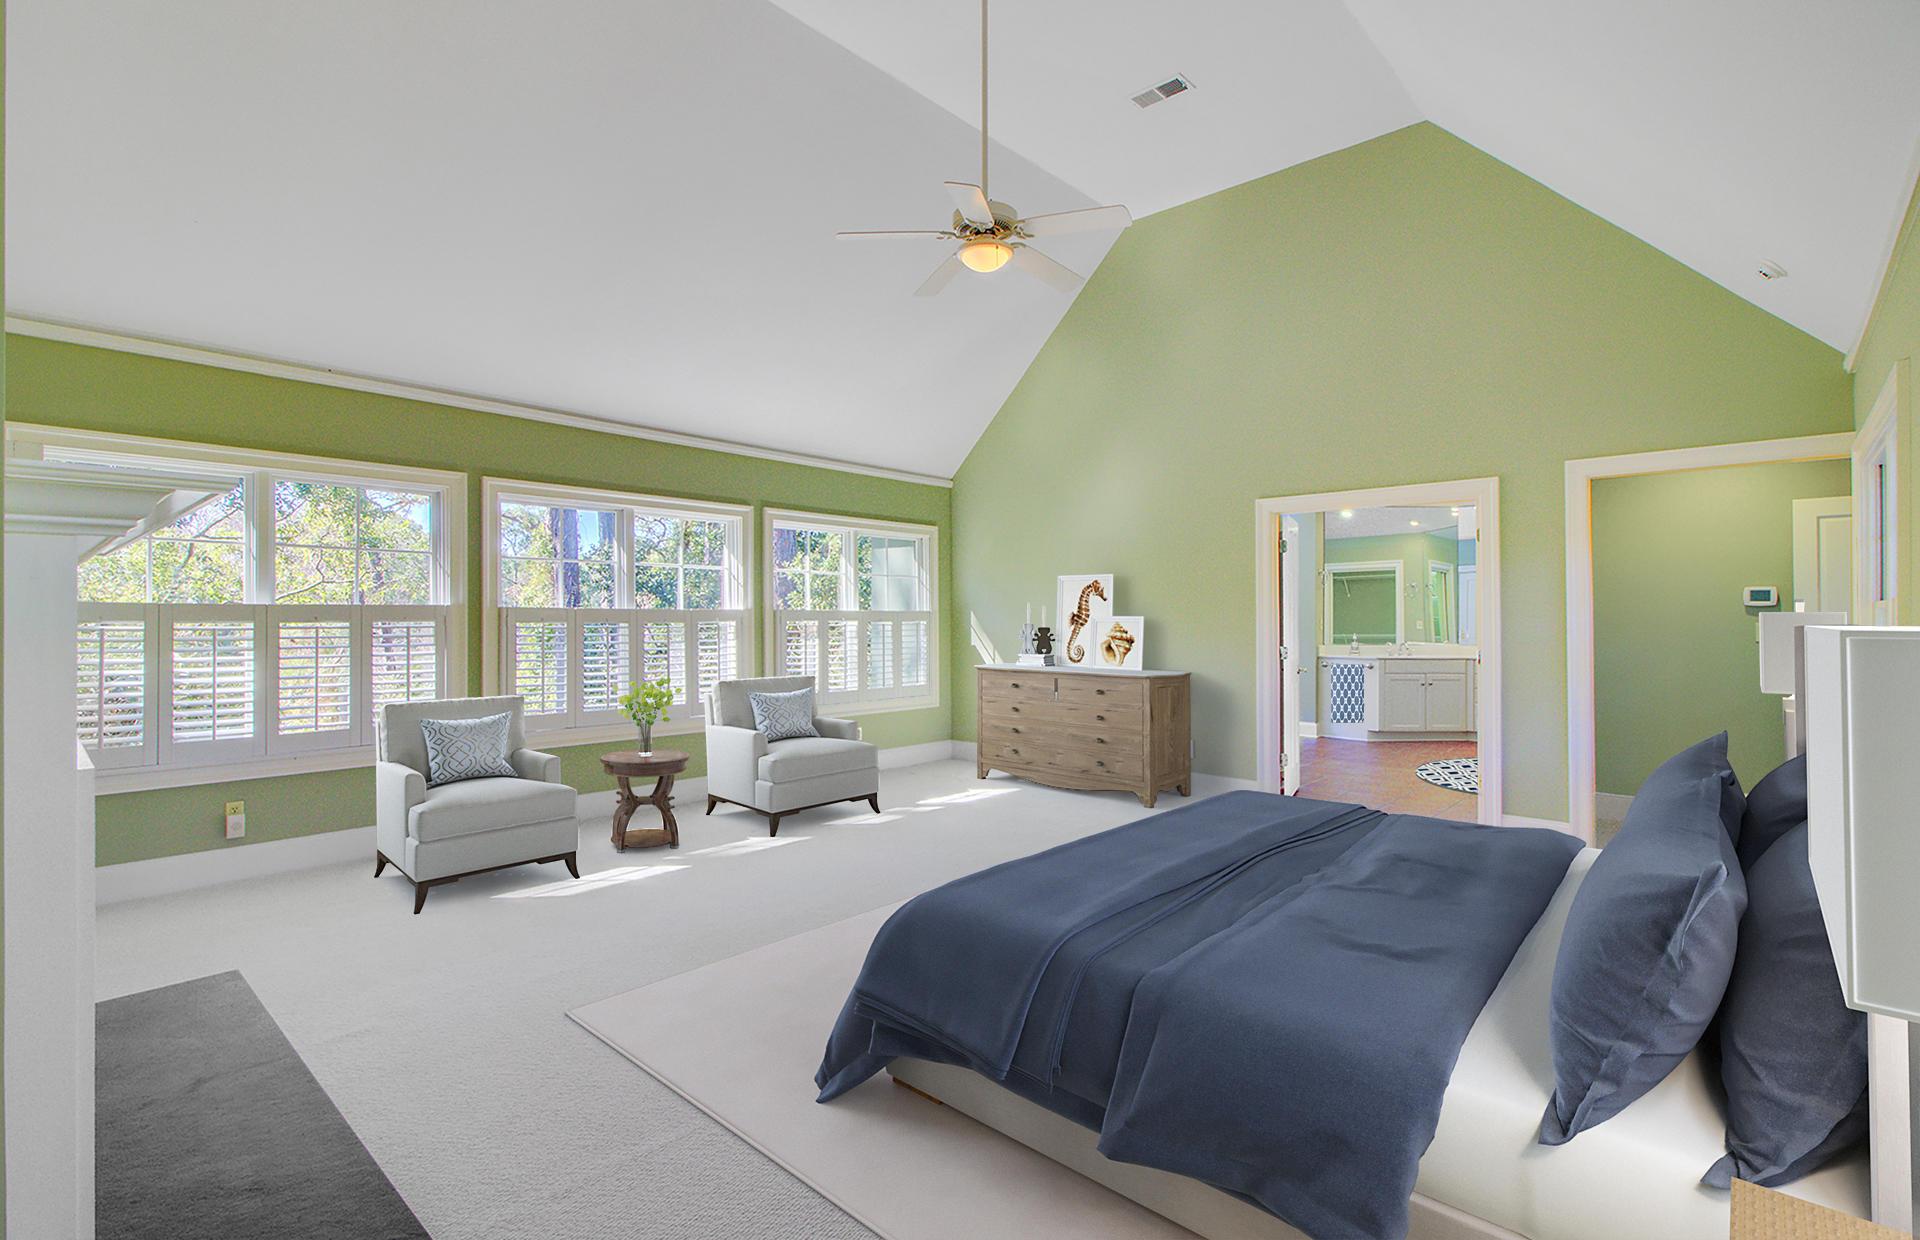 Kiawah Island Homes For Sale - 402 Ocean Oaks, Kiawah Island, SC - 29